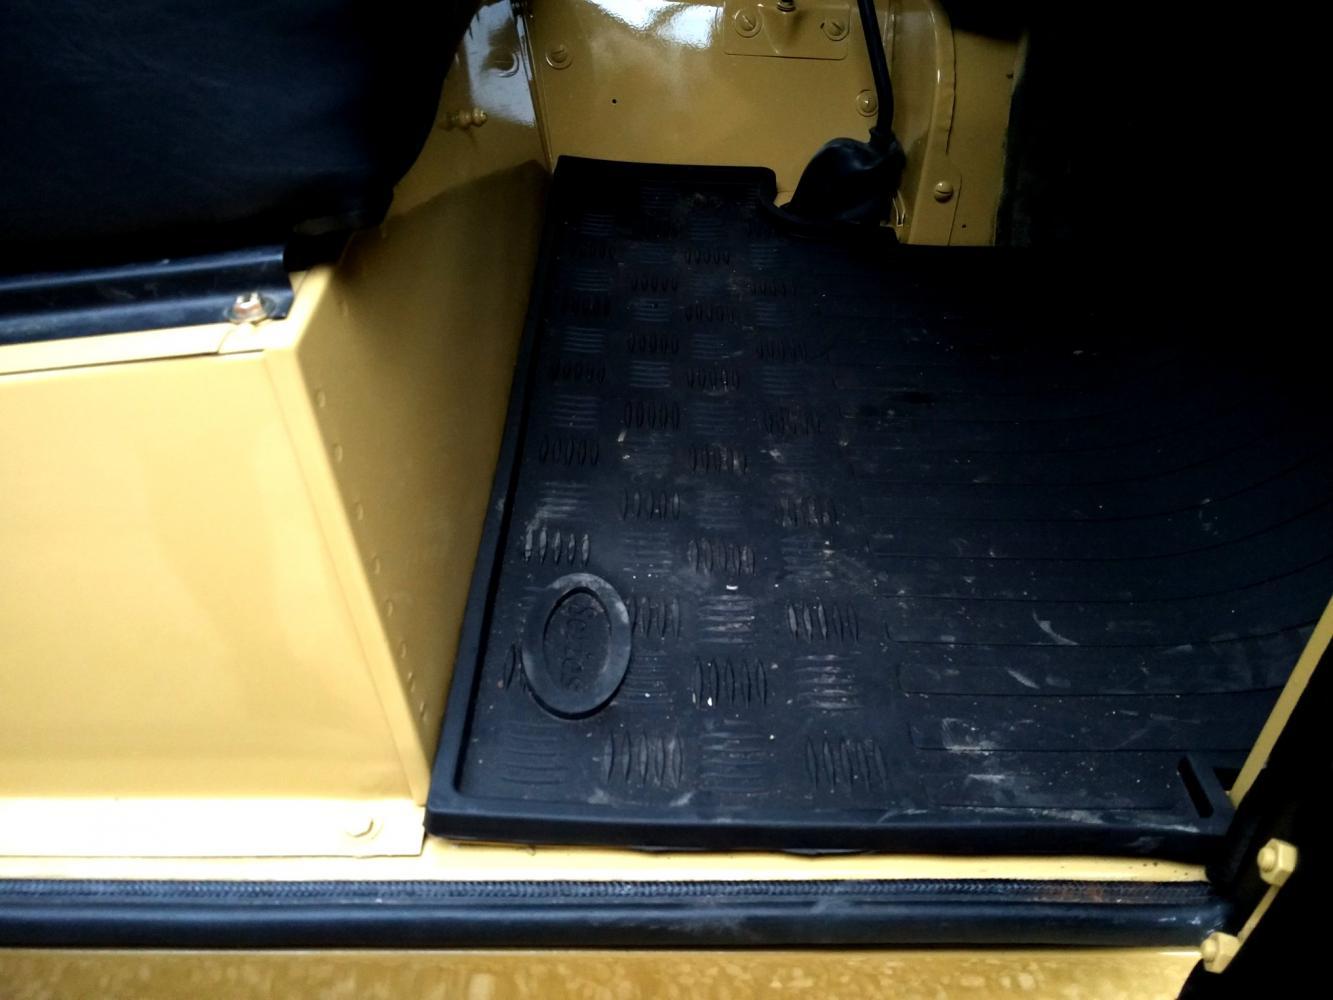 Click image for larger version  Name:1978 LR LHD Santana 88 Hardtop A Mustard Yellow new front floor mats.jpg Views:144 Size:97.4 KB ID:289921